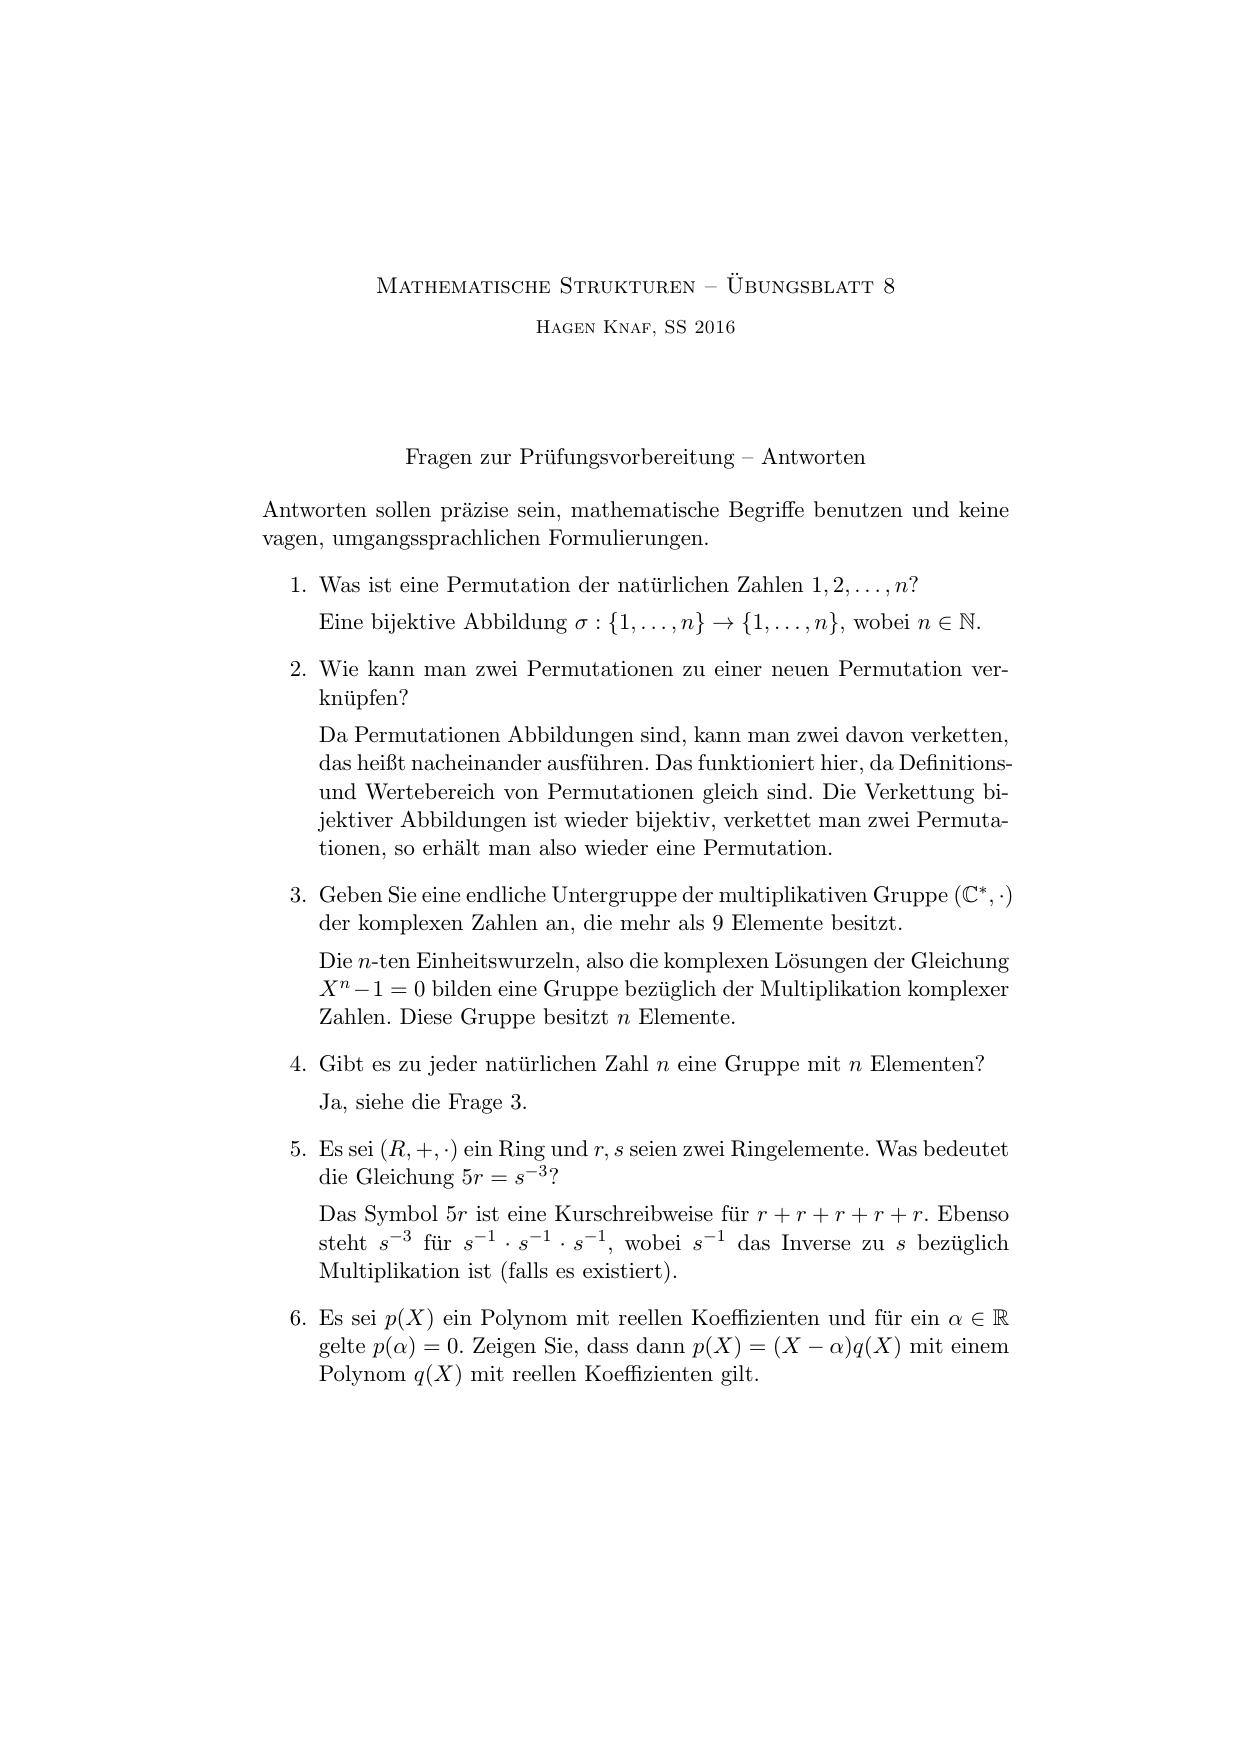 Großzügig 2 X 2 Multiplikation Arbeitsblatt Bilder - Arbeitsblatt ...